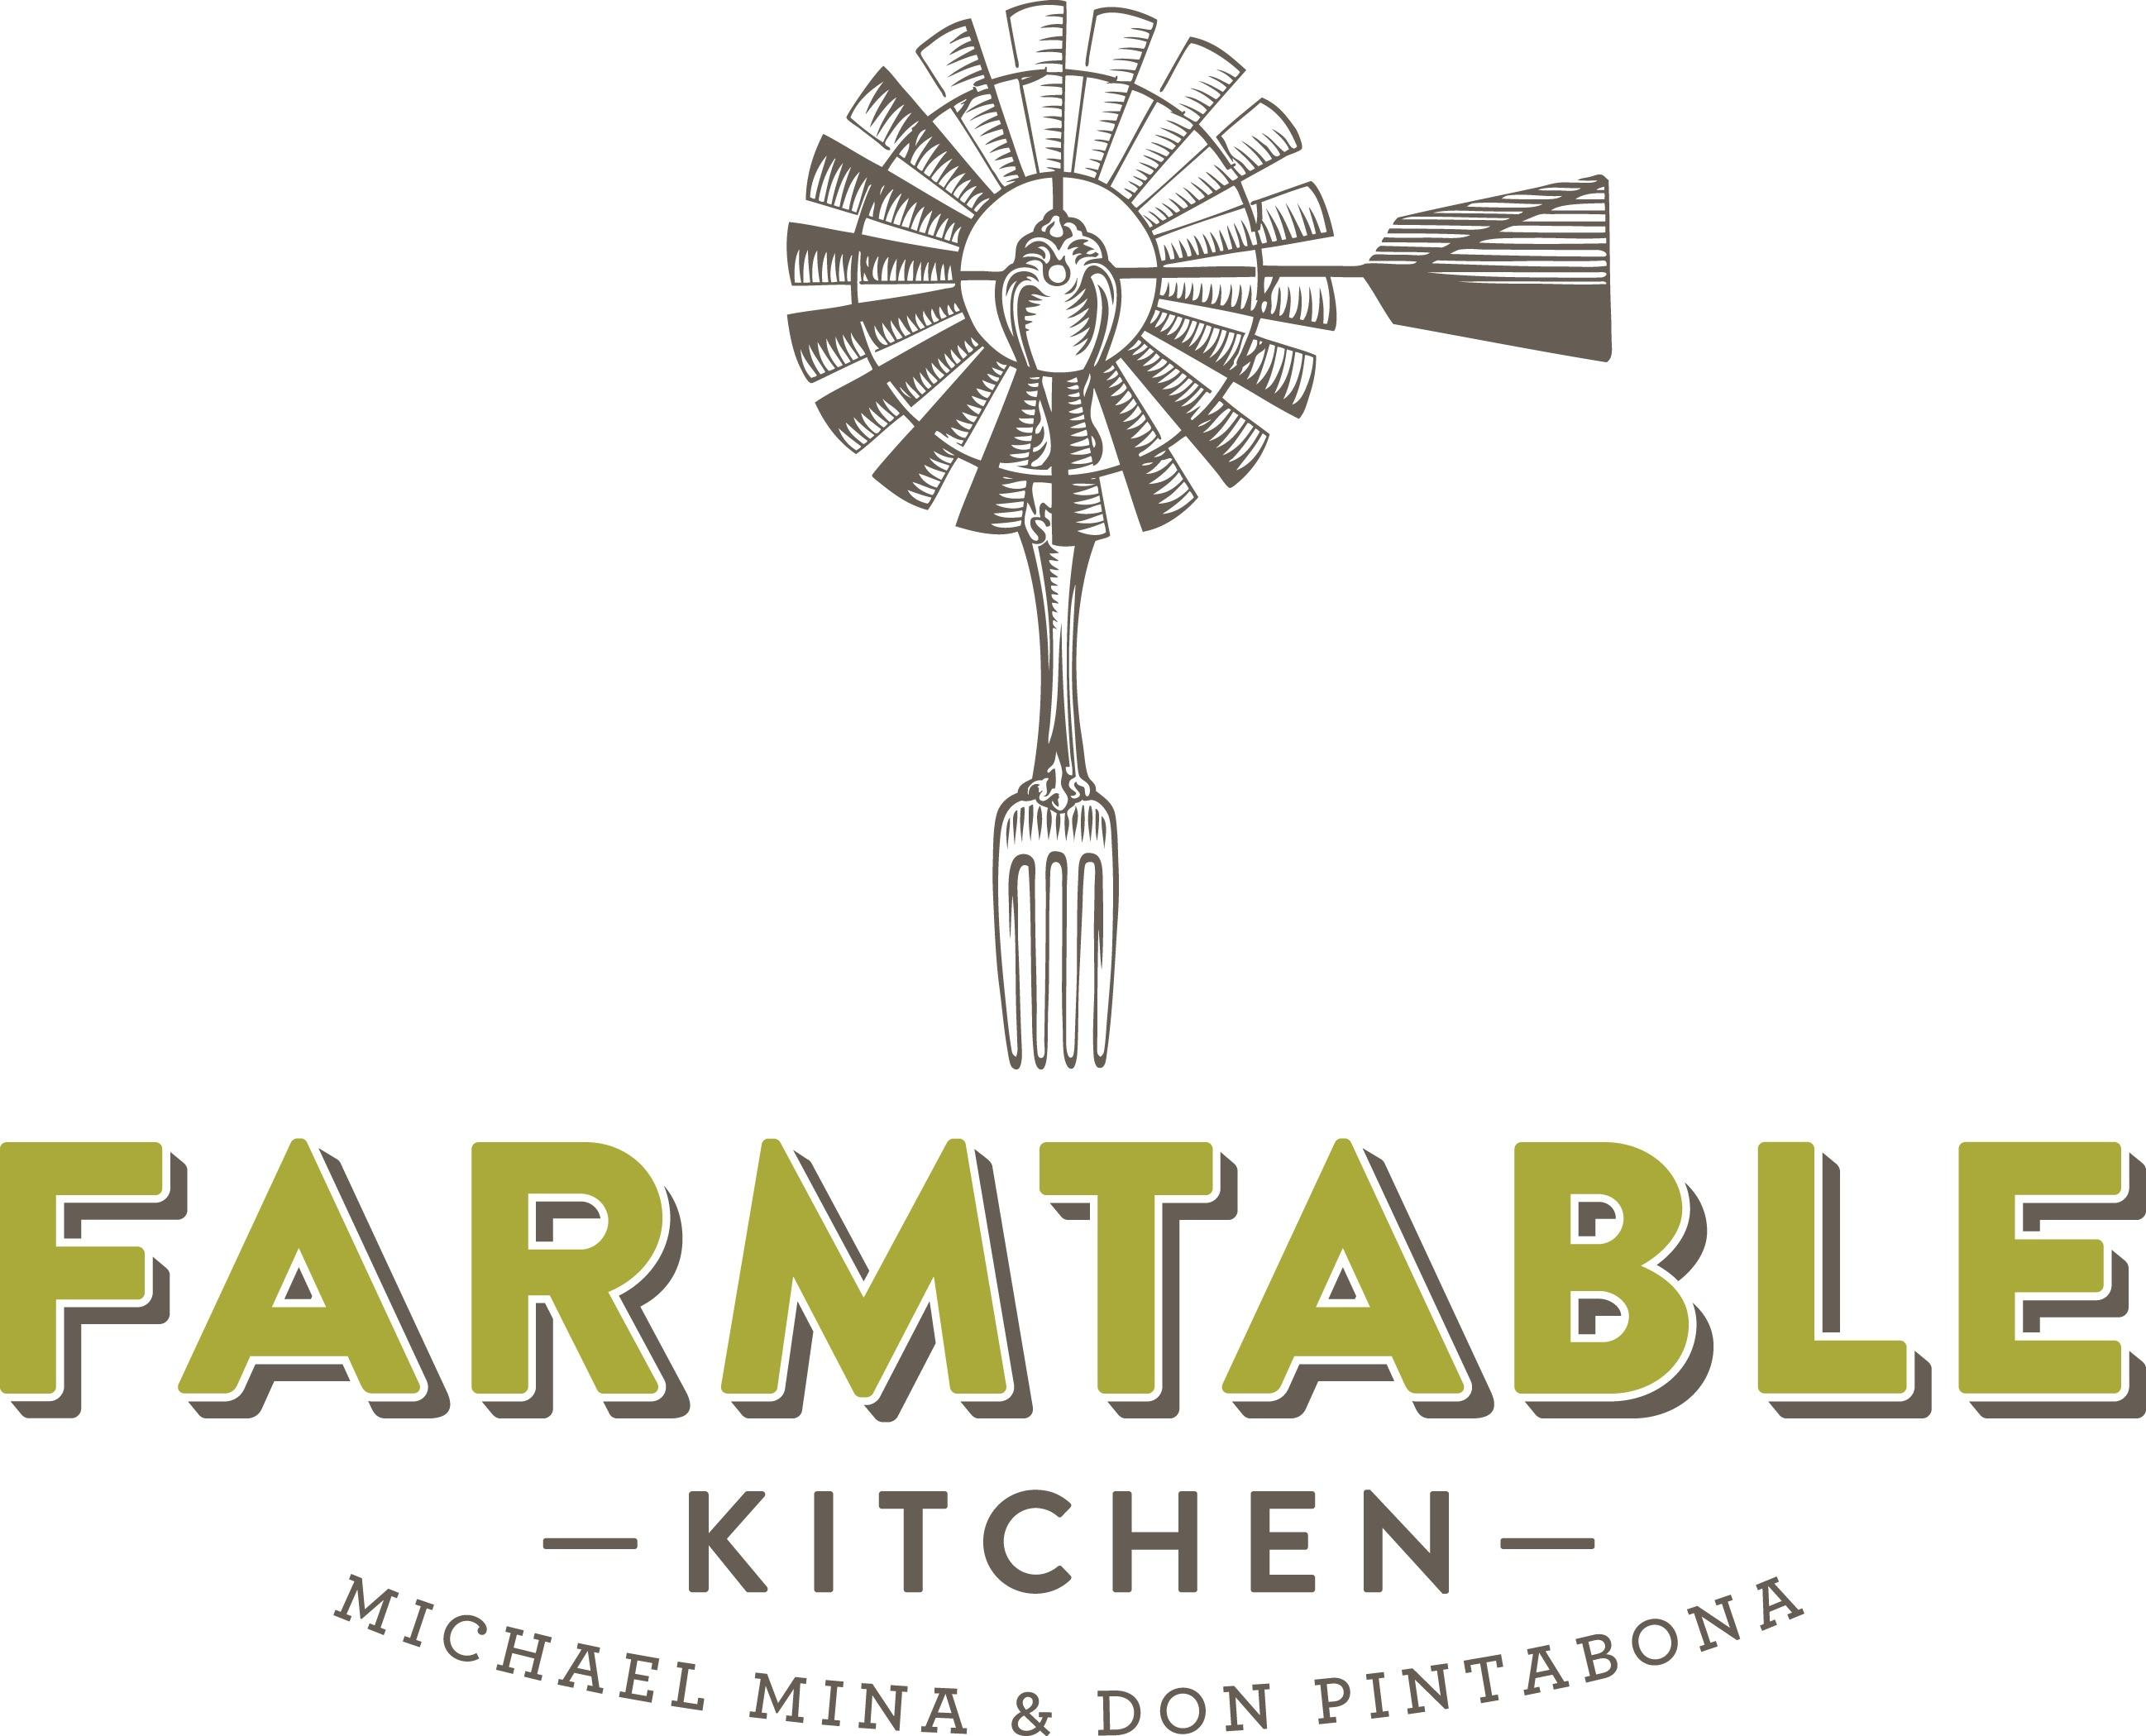 Kitchen Collection Logo Farmtable Kitchen  Login